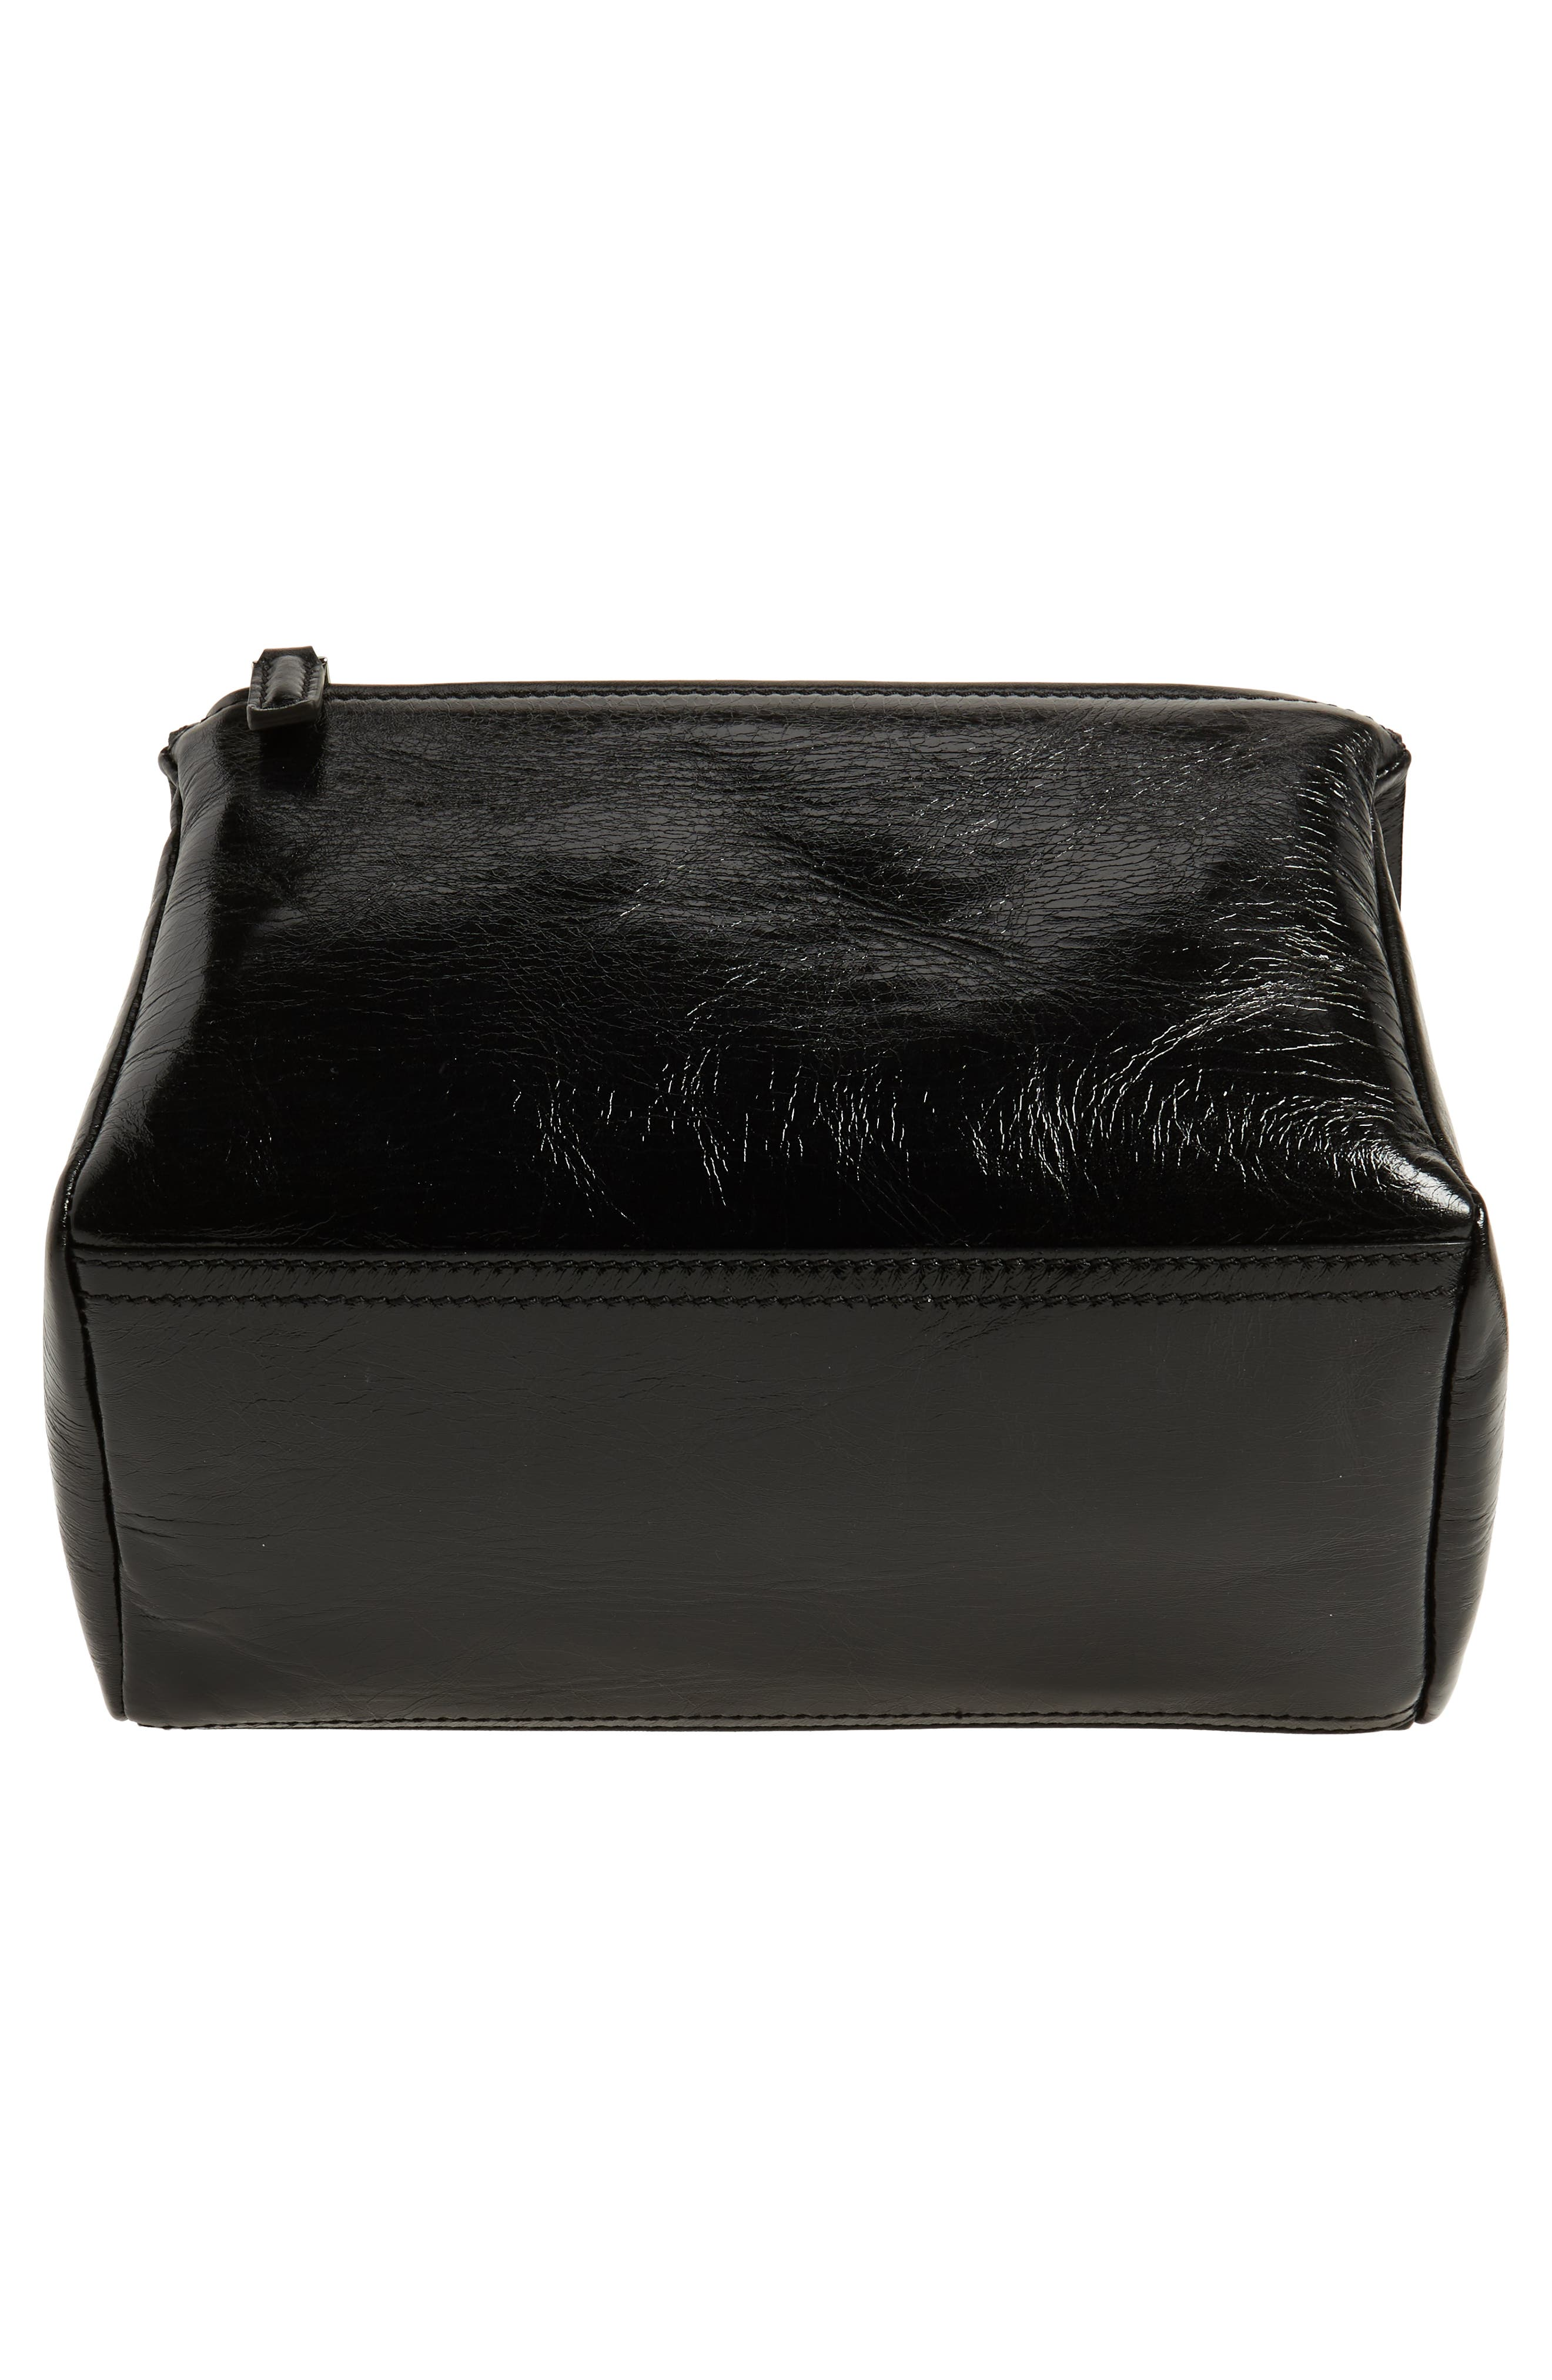 Small Pandora Leather Shoulder Bag,                             Alternate thumbnail 6, color,                             BLACK